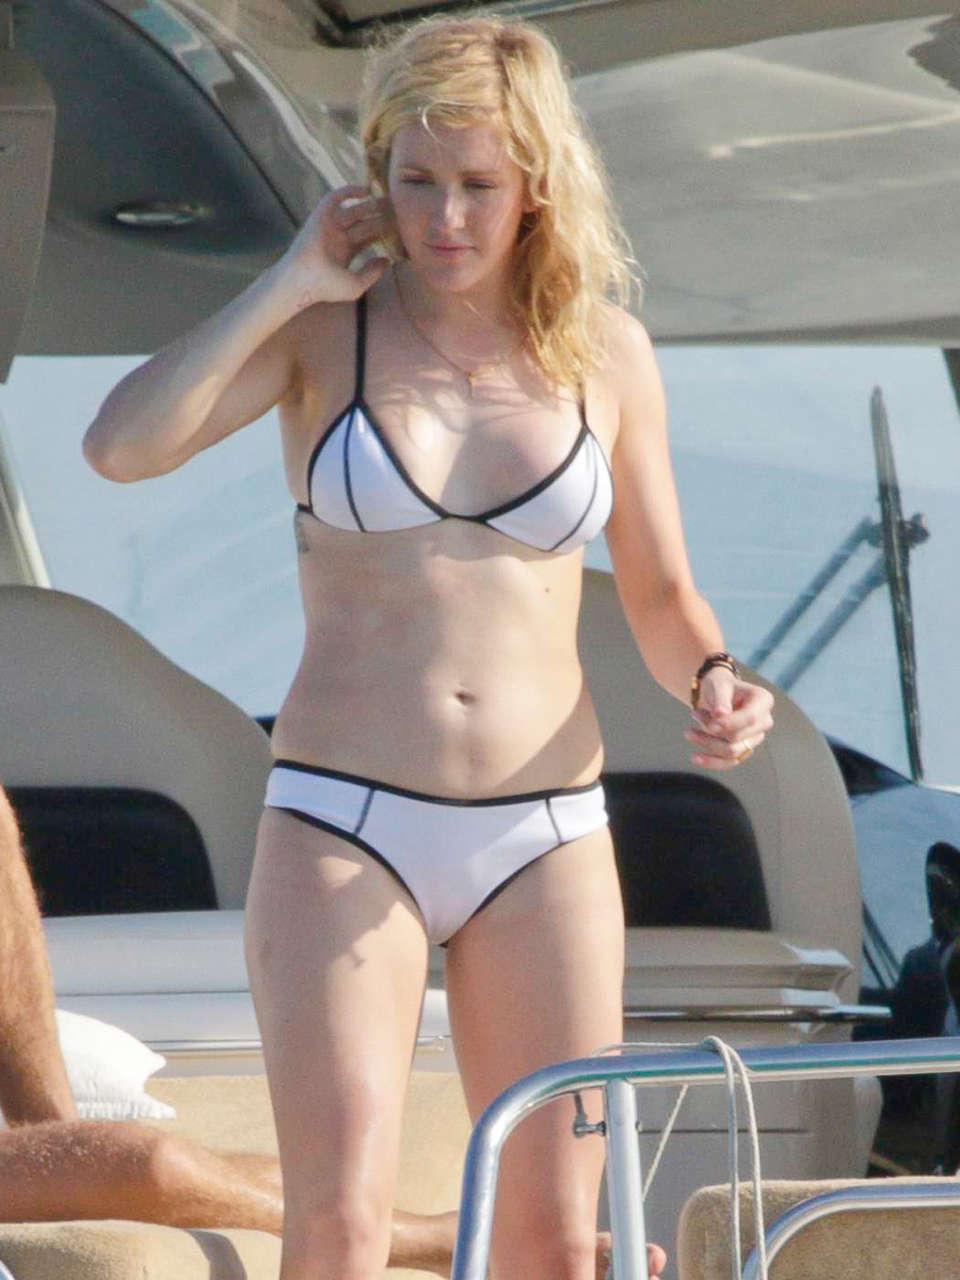 Ellie Goulding in a Bikini on a Yacht in Spain -07 - GotCeleb